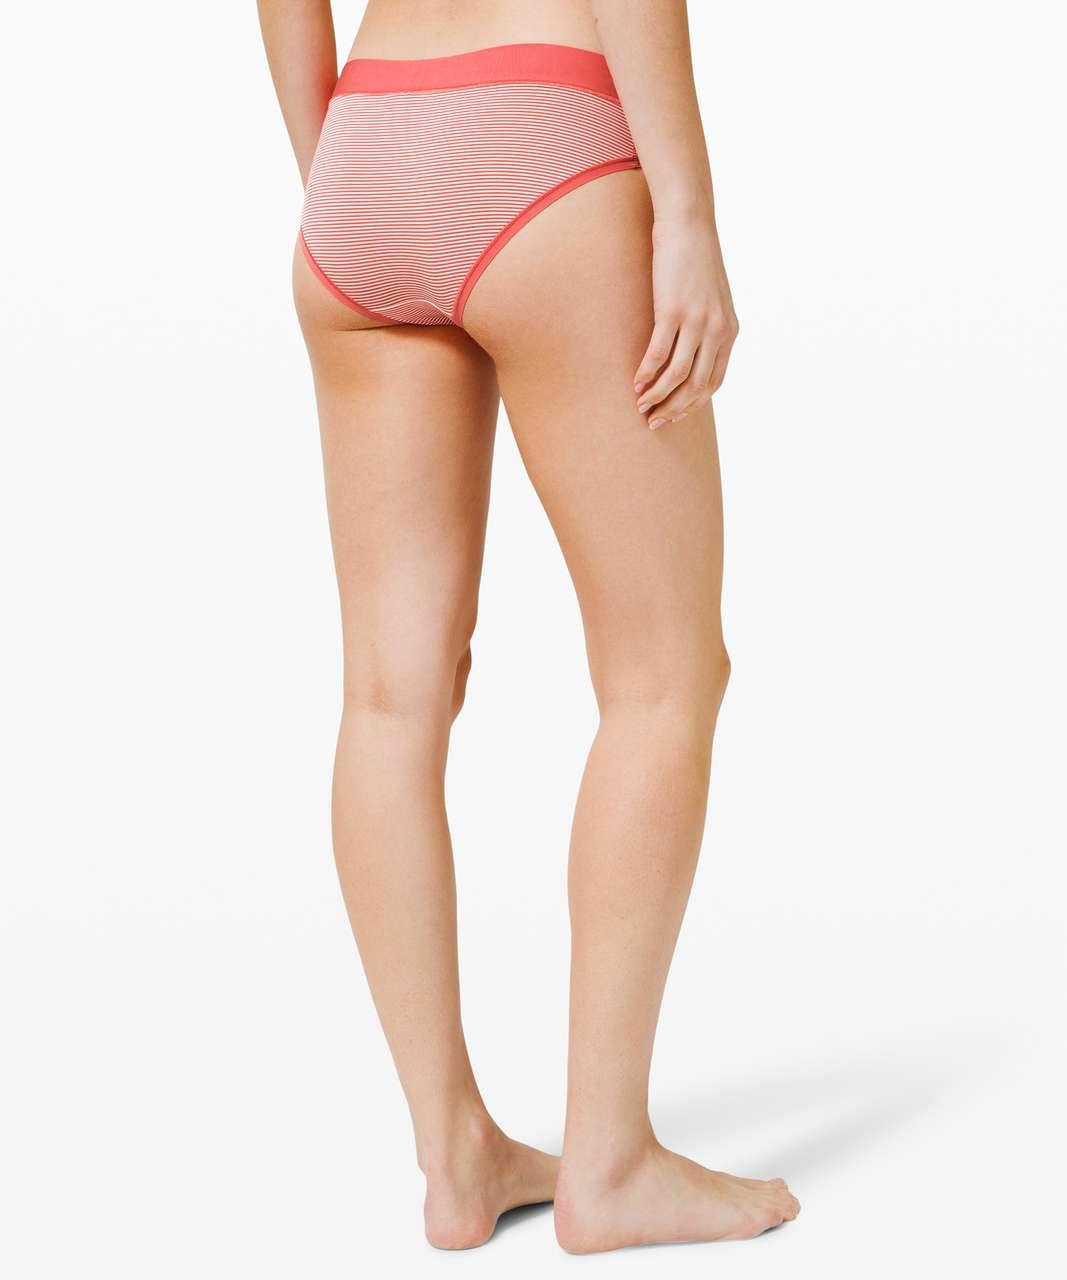 Lululemon Soft Breathable Bikini - Blush Coral